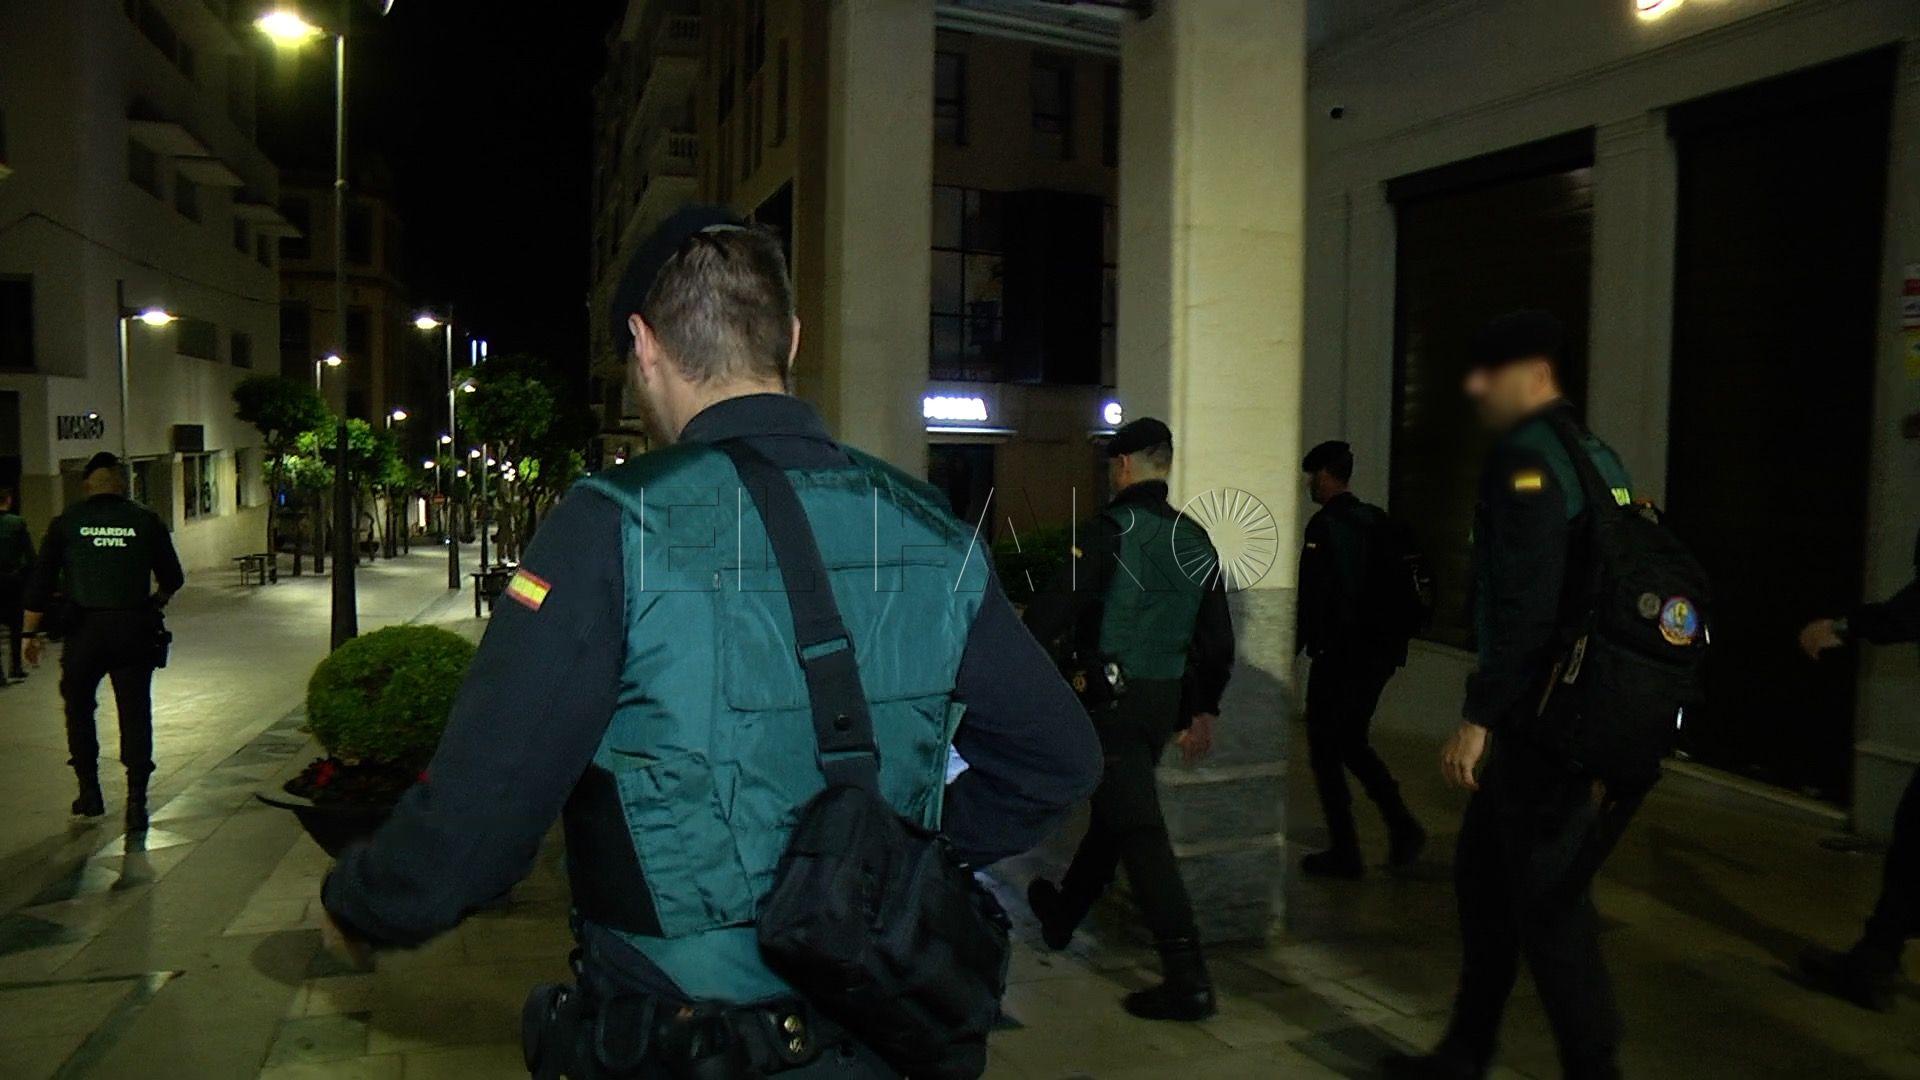 guardia-civil-ceuta-grs-usecic